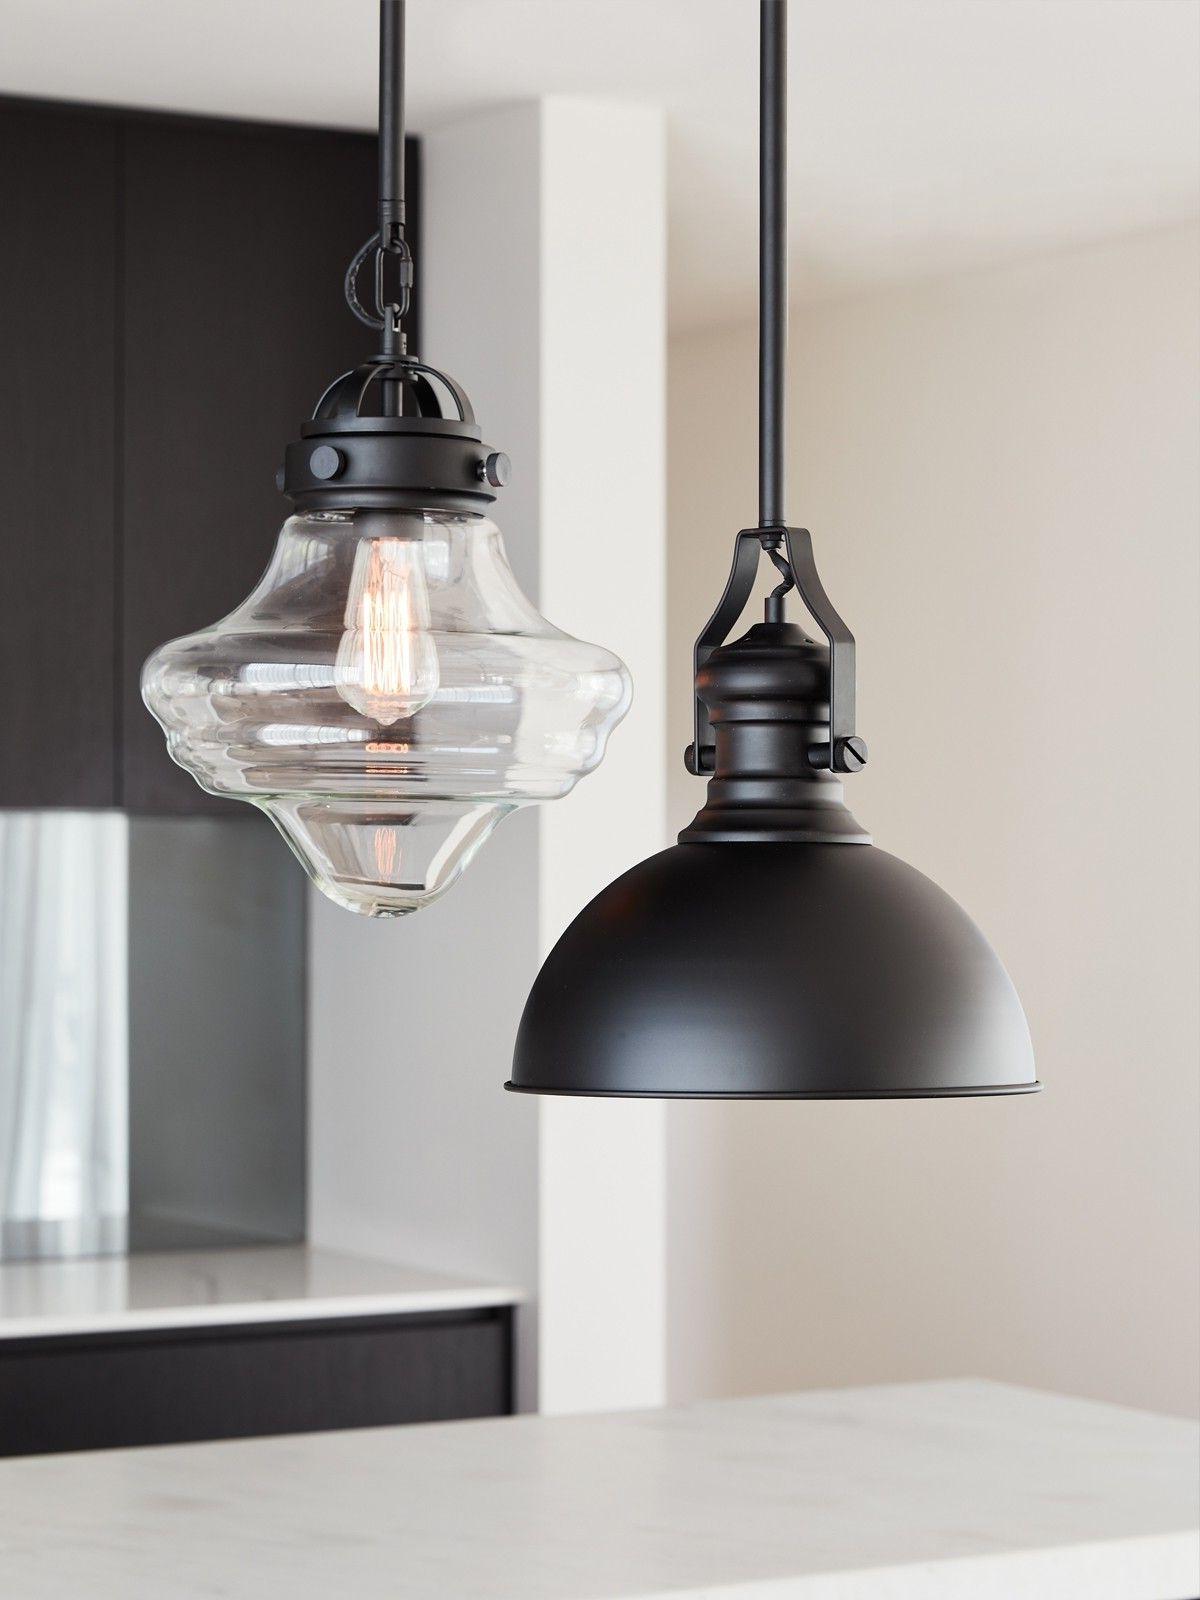 Hamilton 1 Light Single Dome Pendants Throughout Fashionable Hamilton 1 Light Pendant In Black (View 9 of 25)